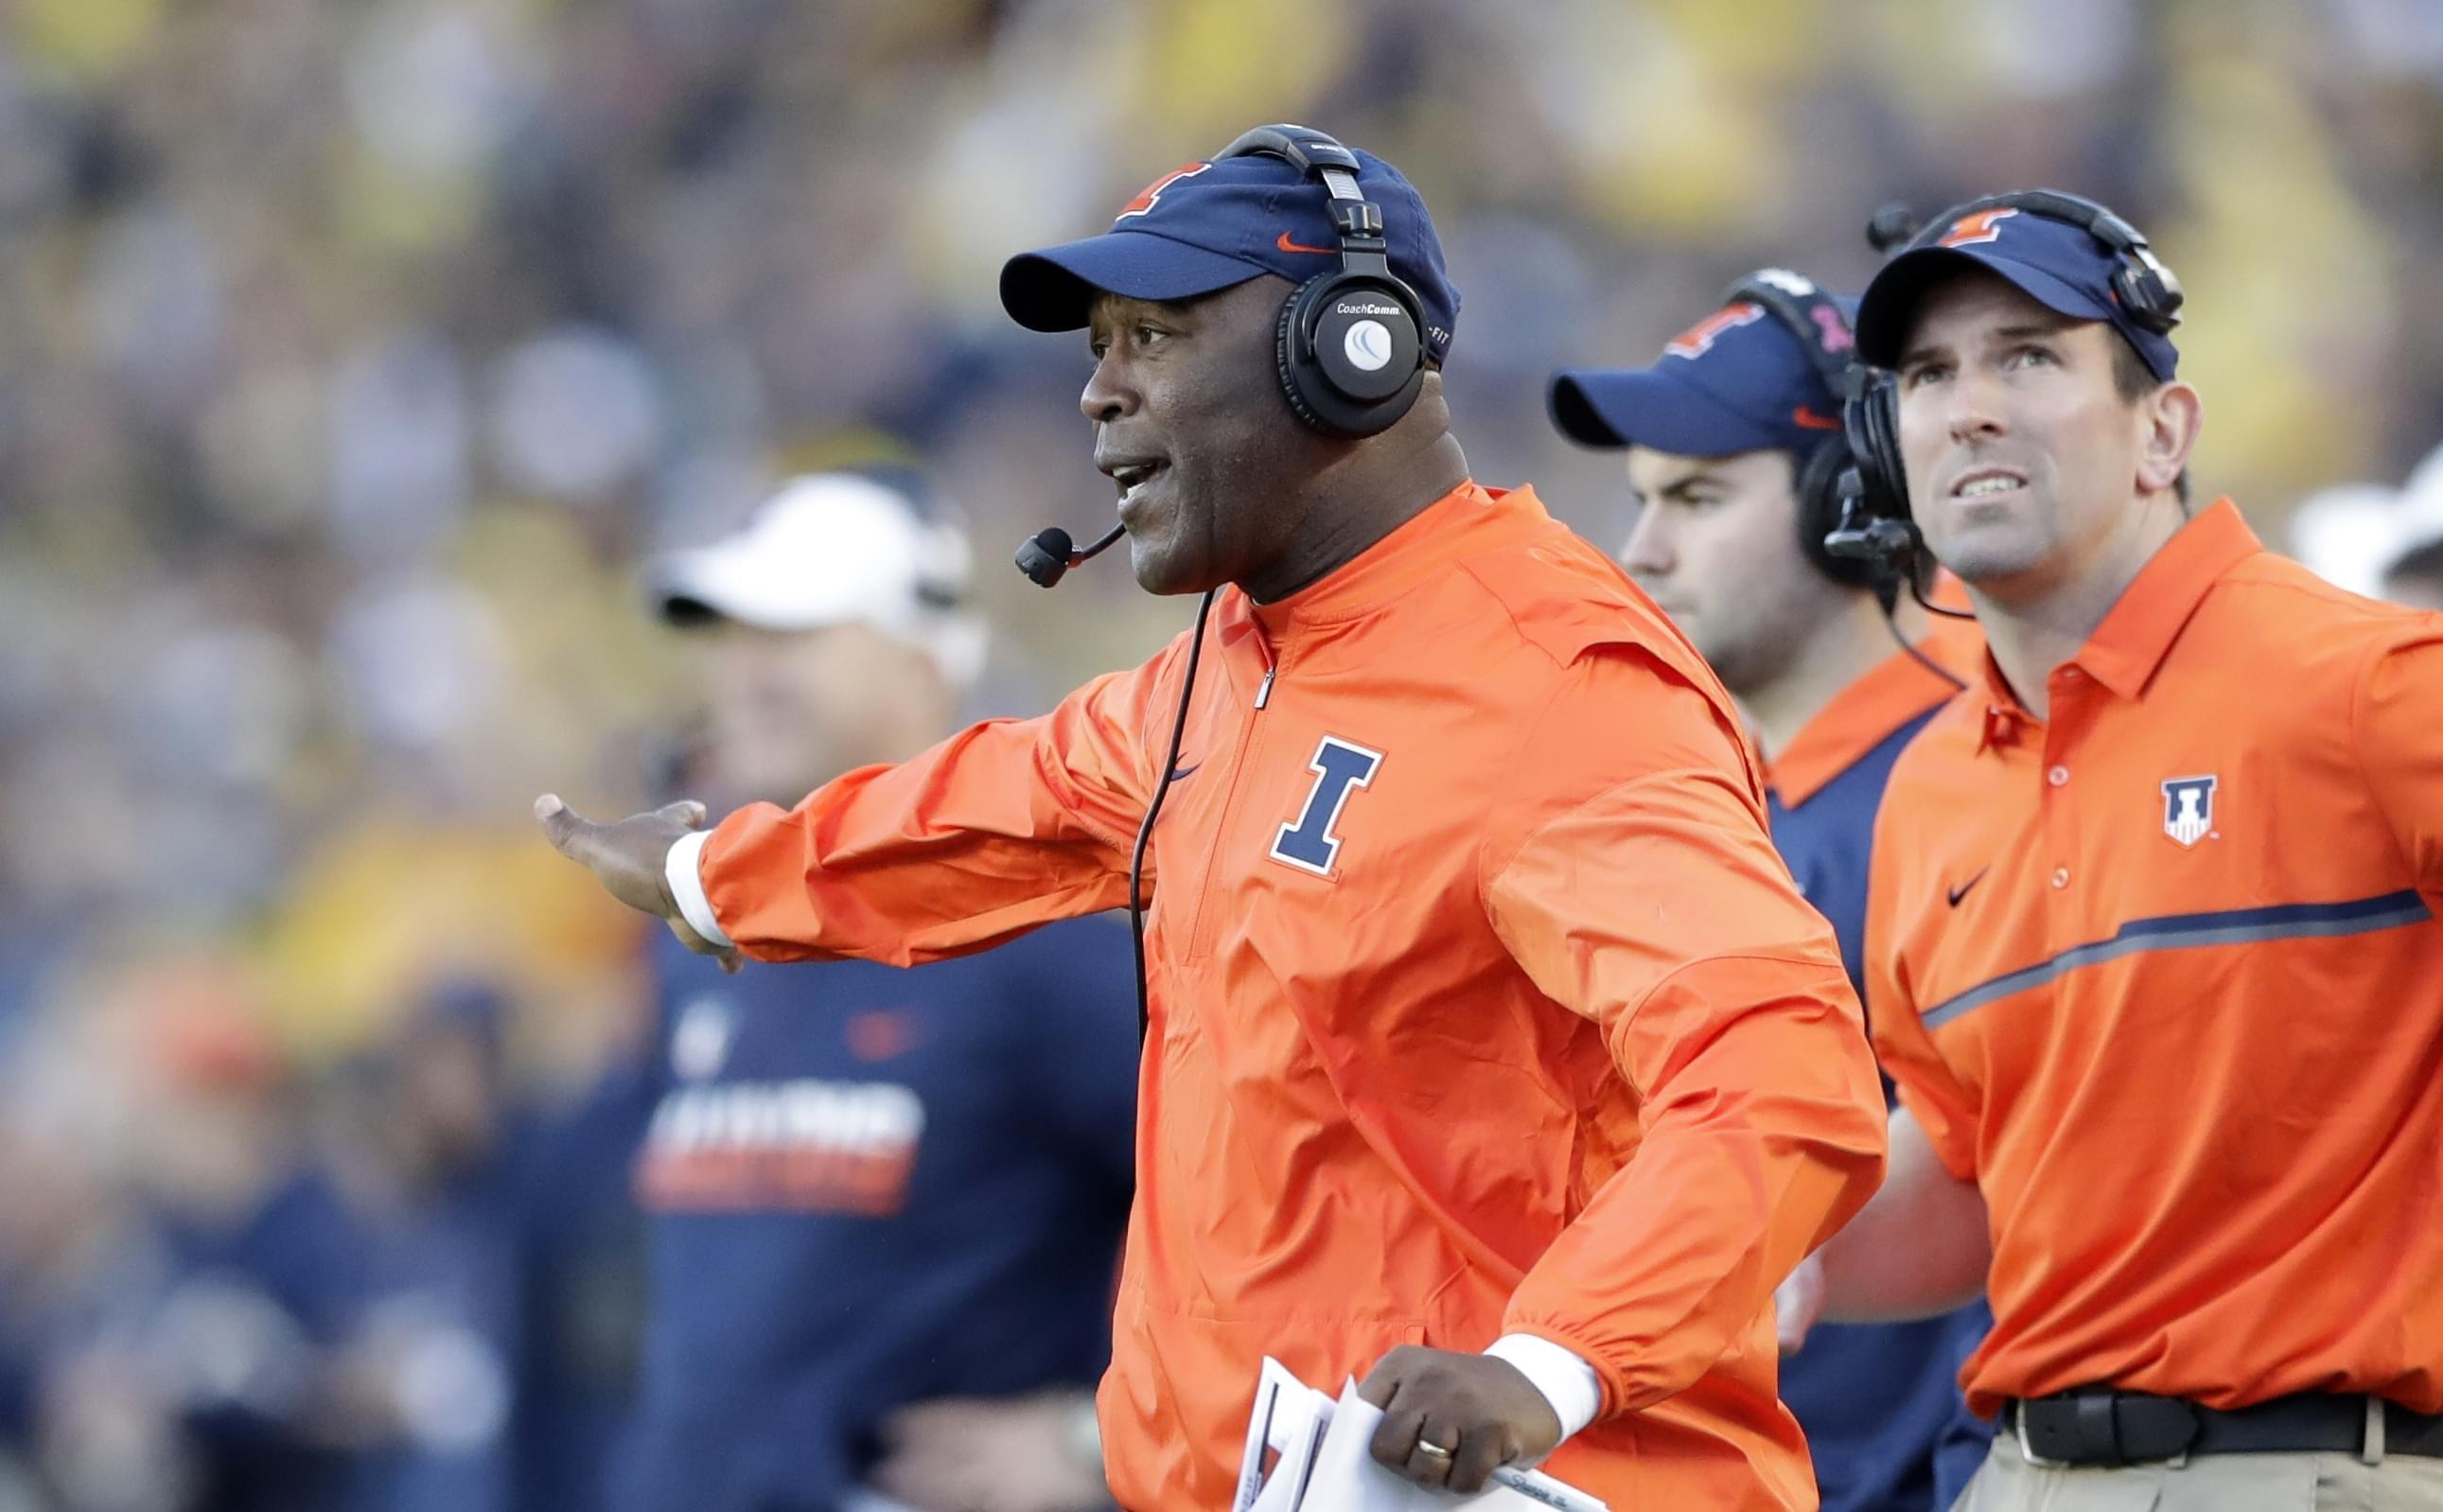 University of Illinois head football coach Lovie Smith